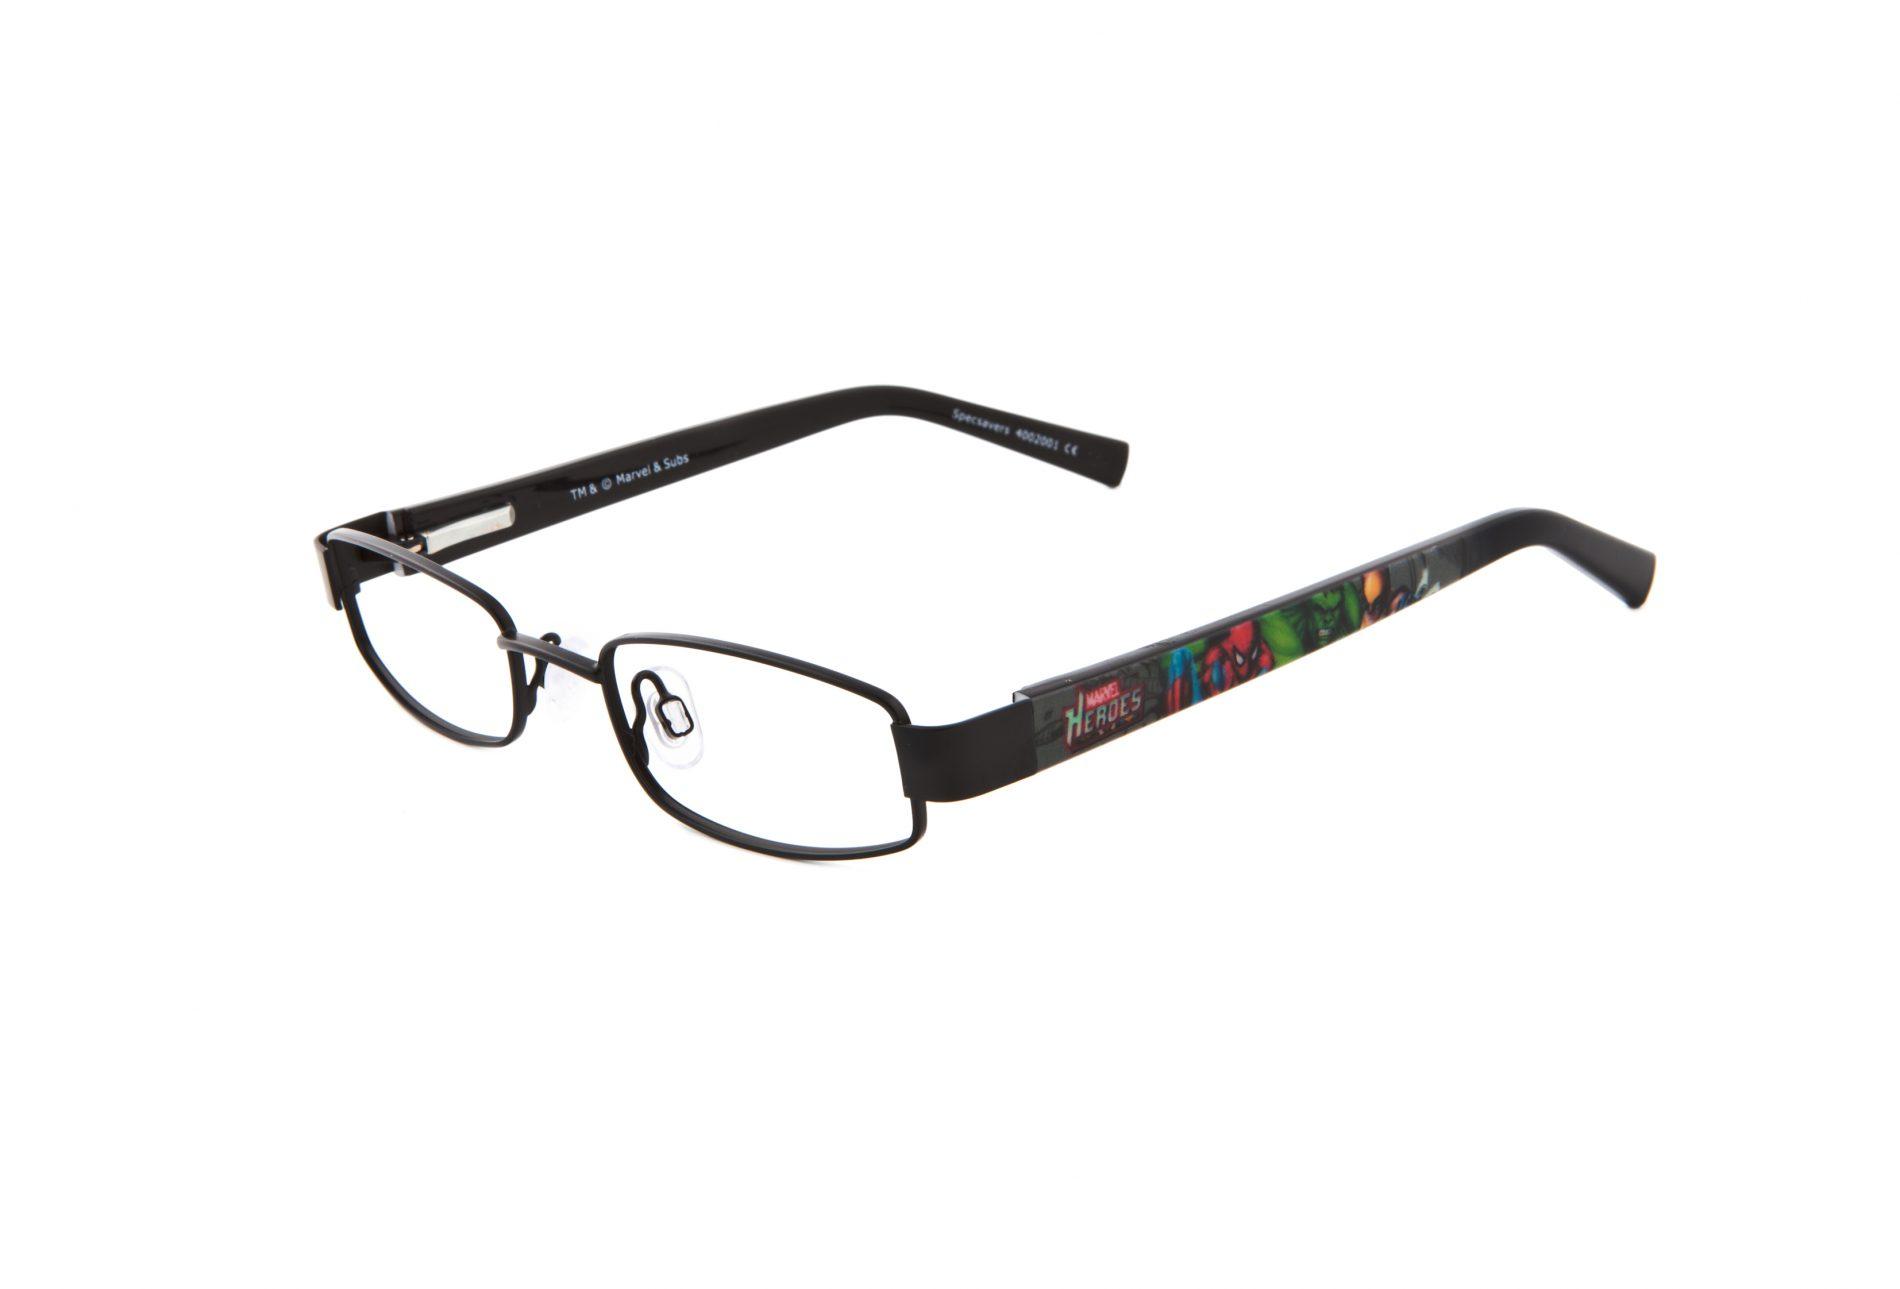 Glasses Frames Wide Bridge : Wide Nose Bridge Glasses - Viewing Gallery